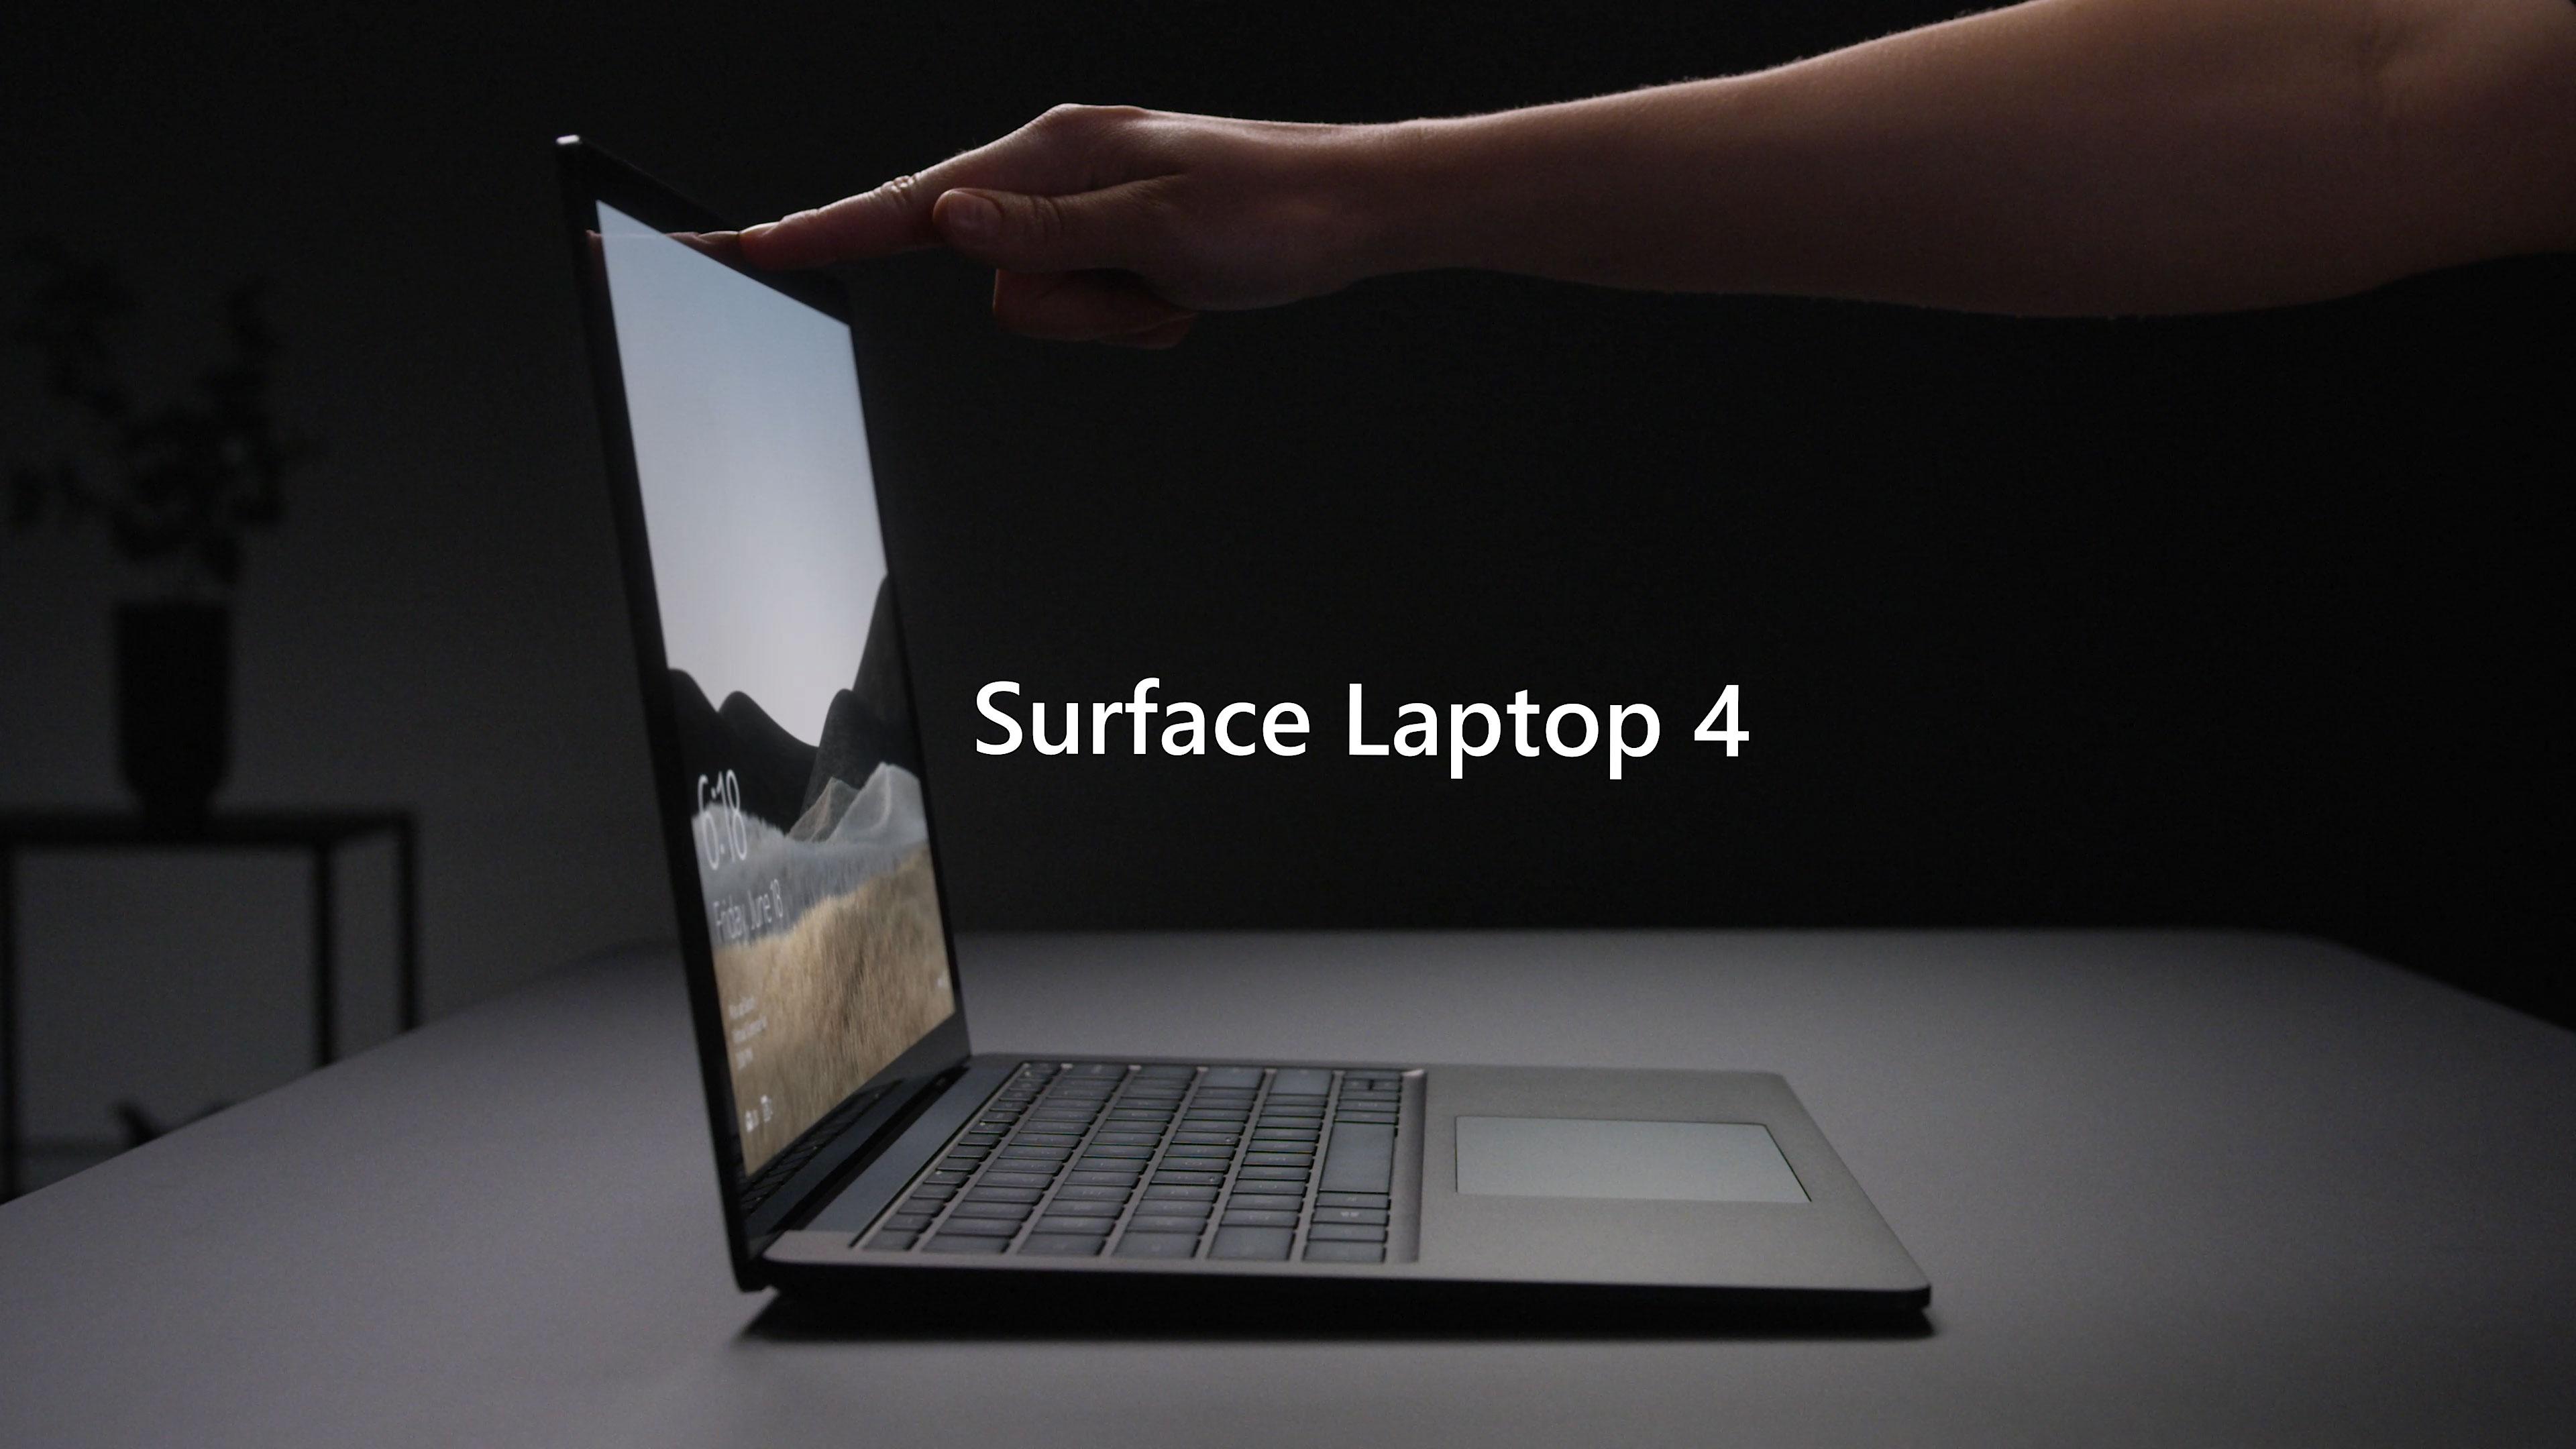 Surface Laptop 4 典雅黑